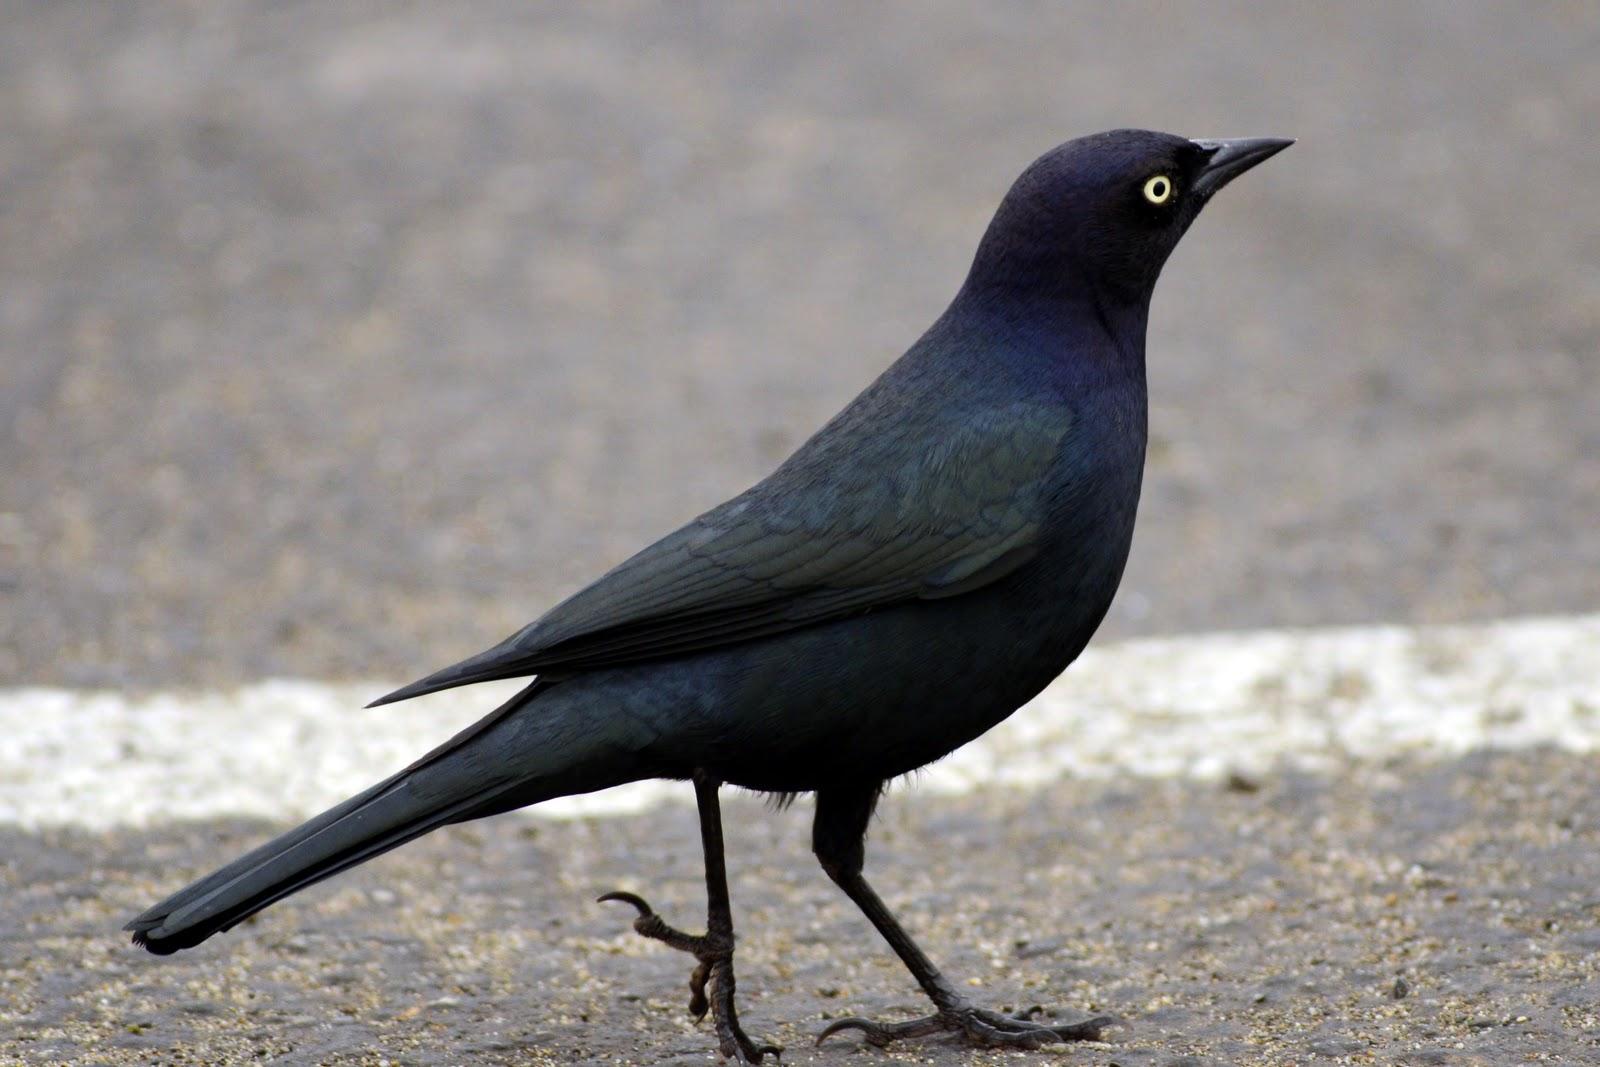 birds resolution blackbirds bird blackbird common western cutest those hdblackwallpaper brewer very